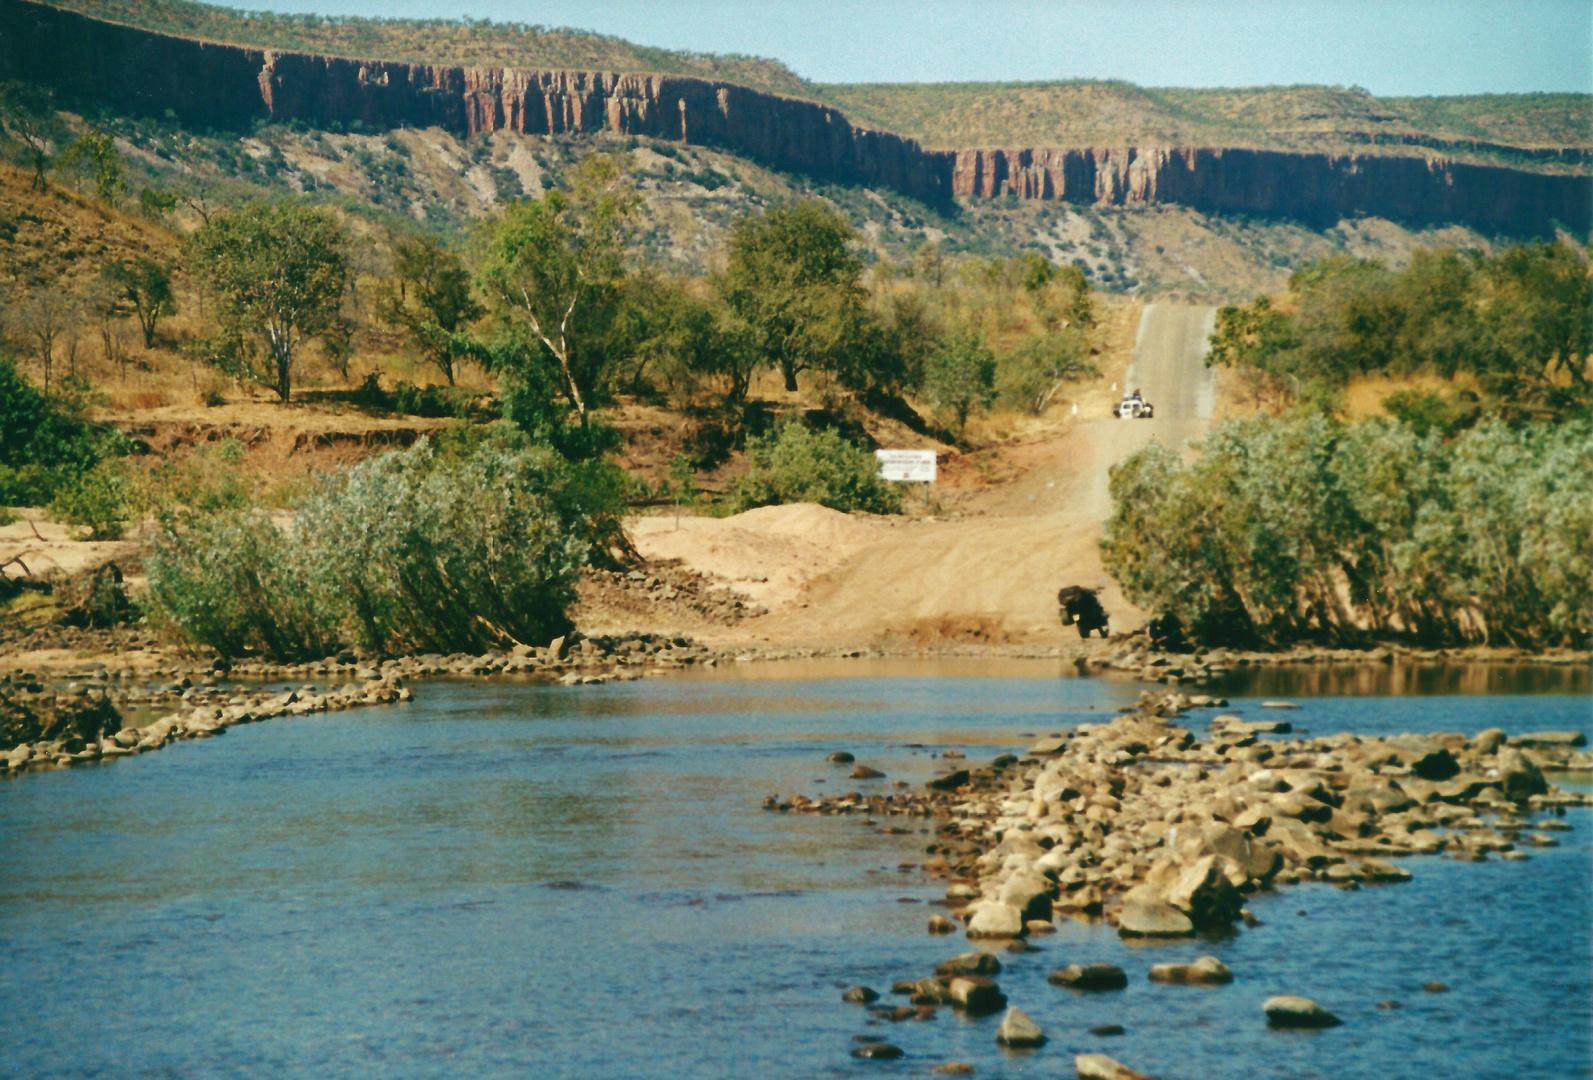 Australien (2002), Pentecost River